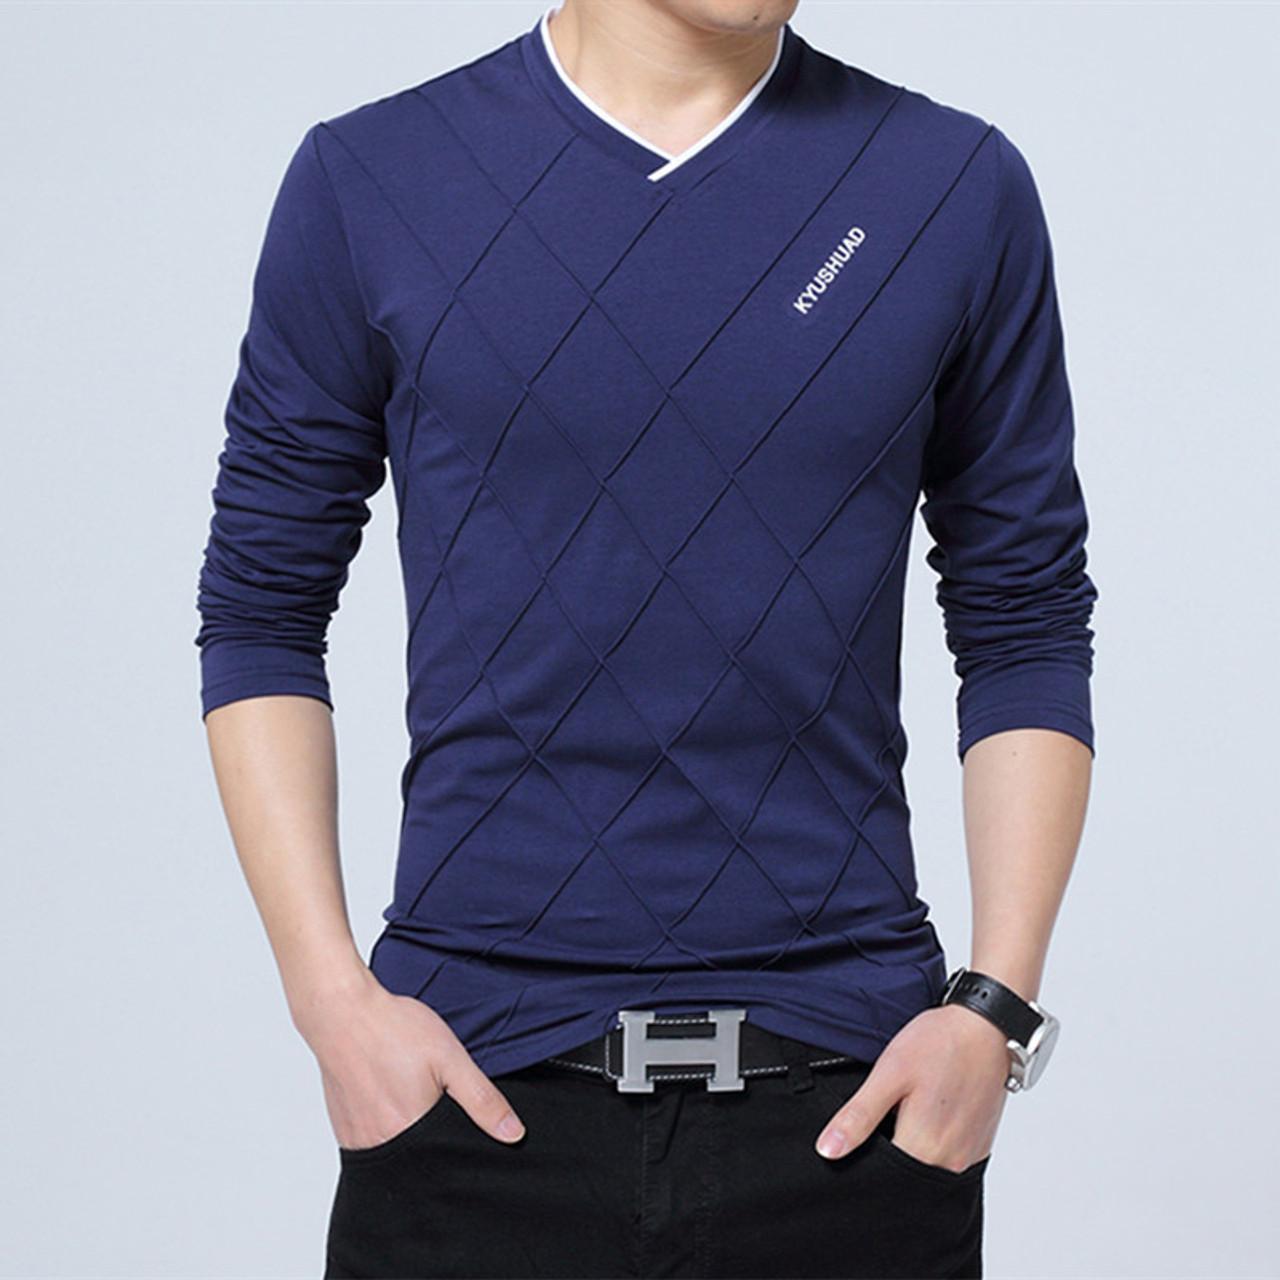 9503614682c ... 2018 Mens Spring Casual T-shirt Fashion Slim Long Sleeve V Neck Fitness  T- ...